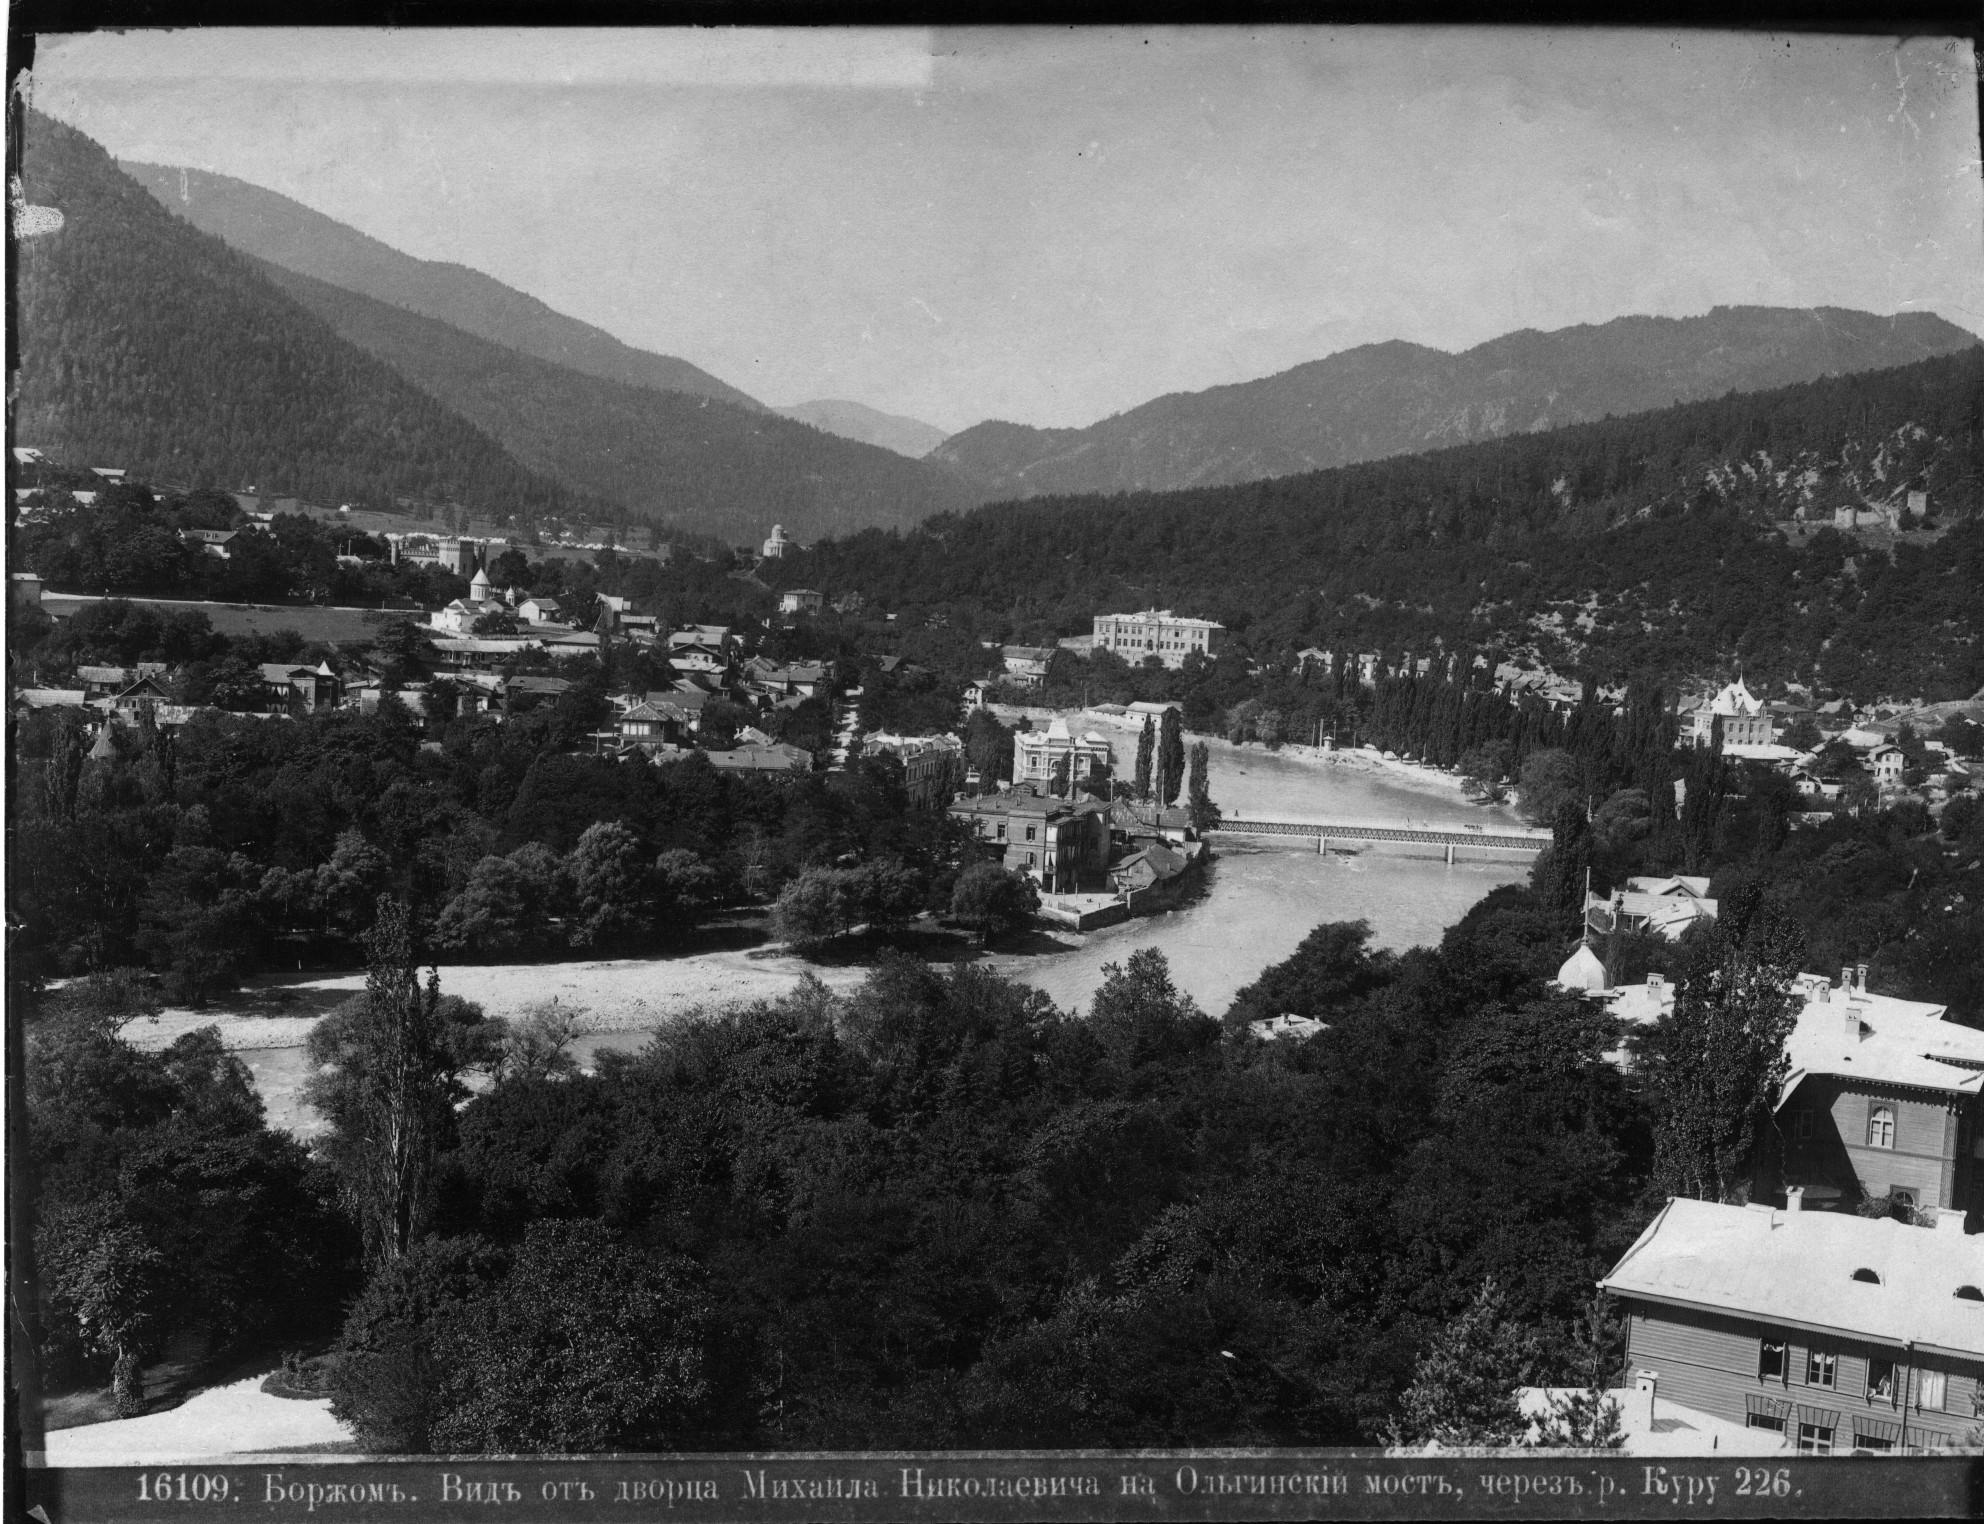 Вид от дворца В. К. Михаила Николаевича на Ольгинский мост через реку Куру